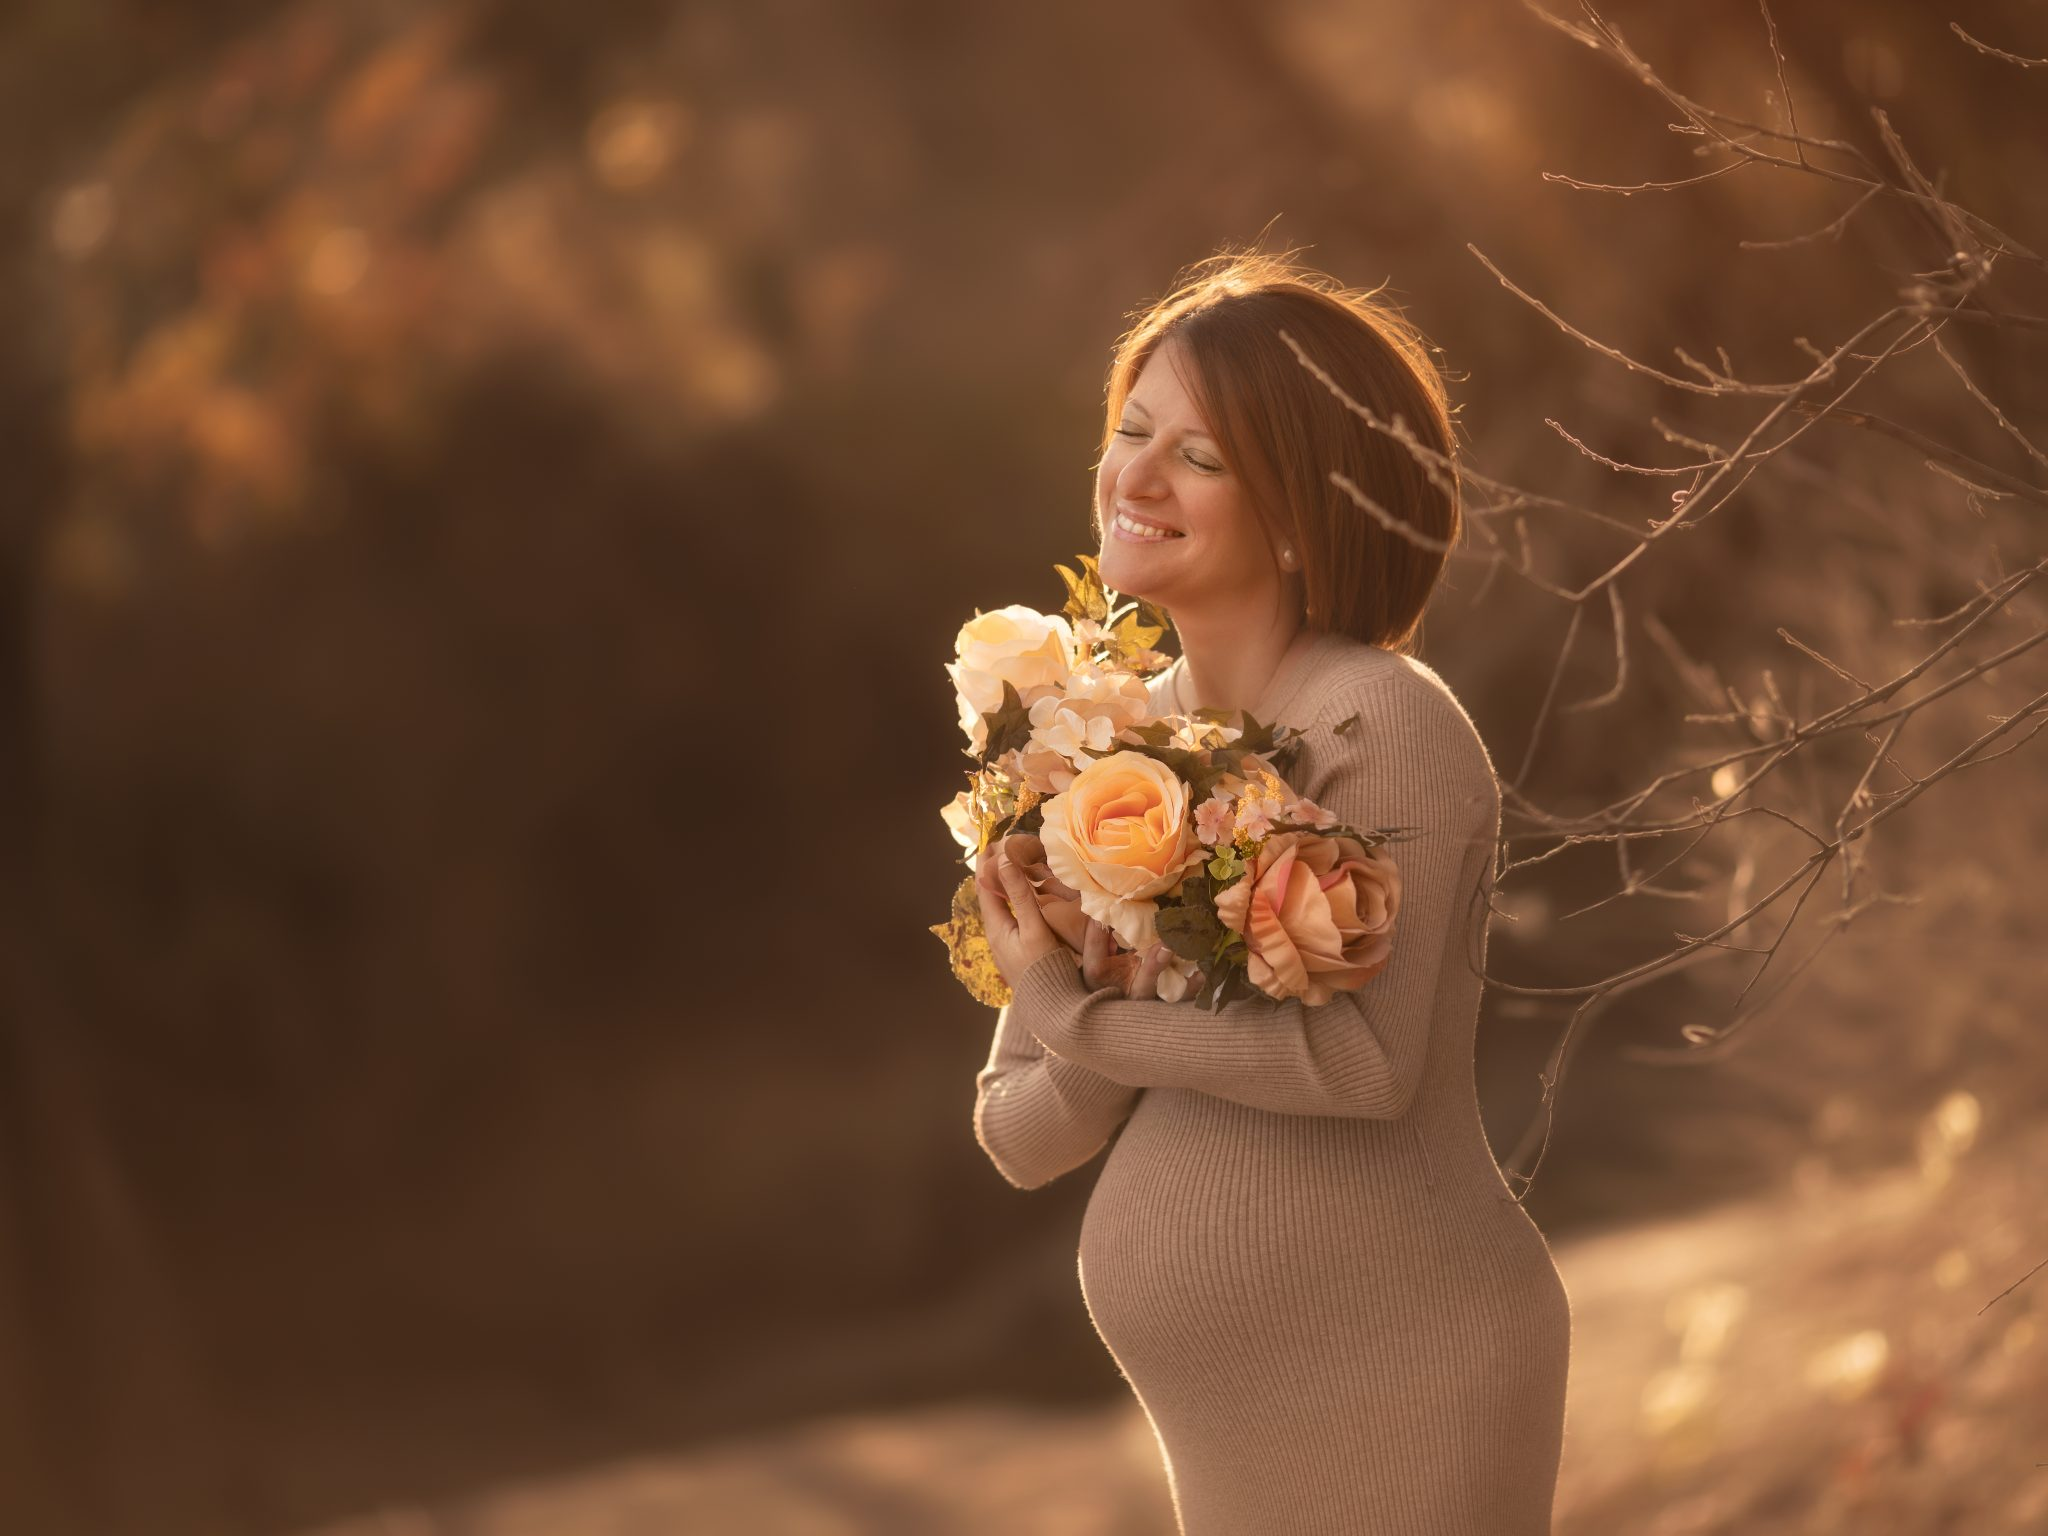 fotografia fine art madrid embarazo